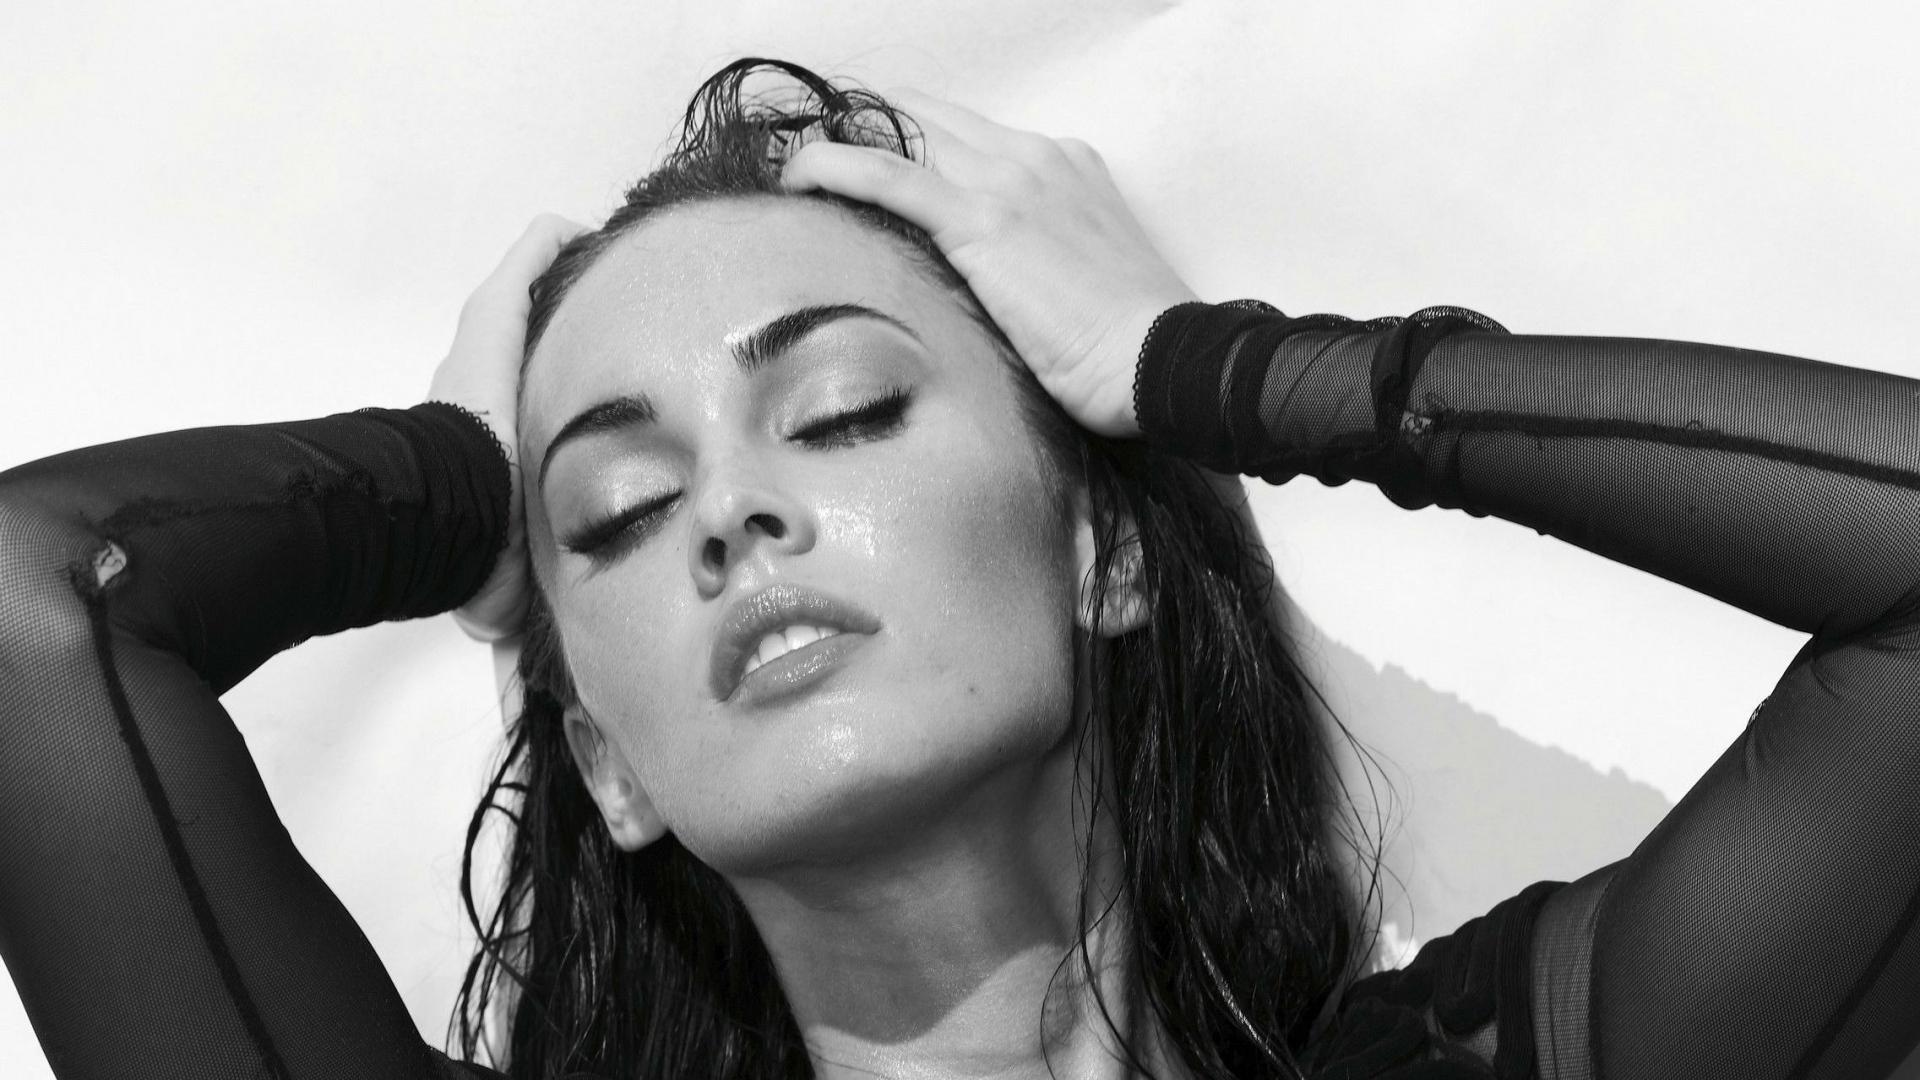 Photos Of Megan Fox